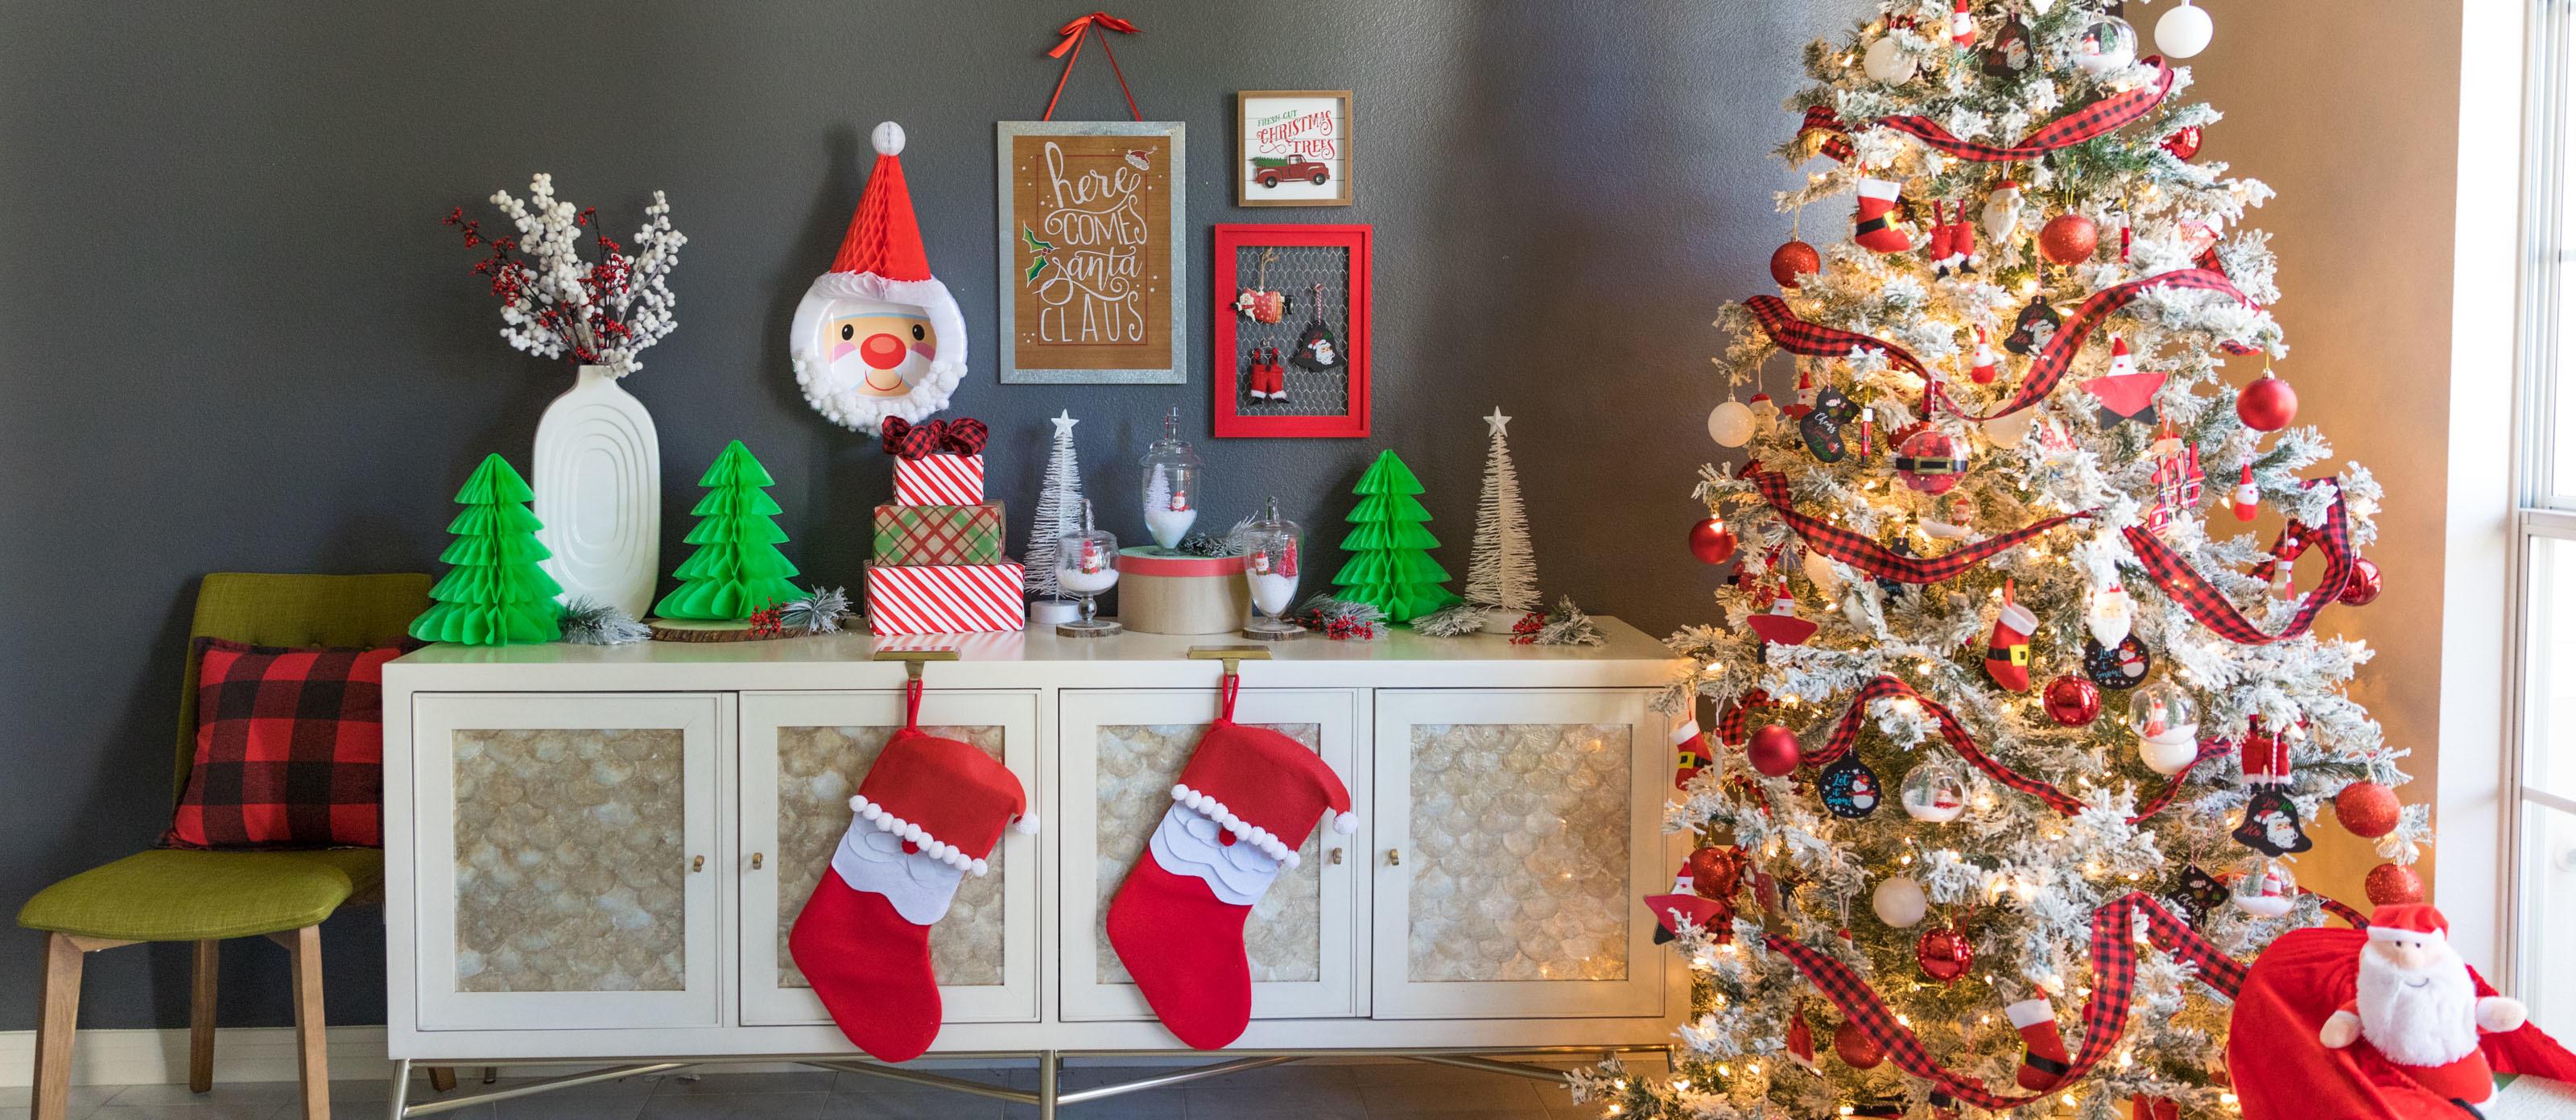 Santa Claus Themed Christmas Tree And Decor Fun365